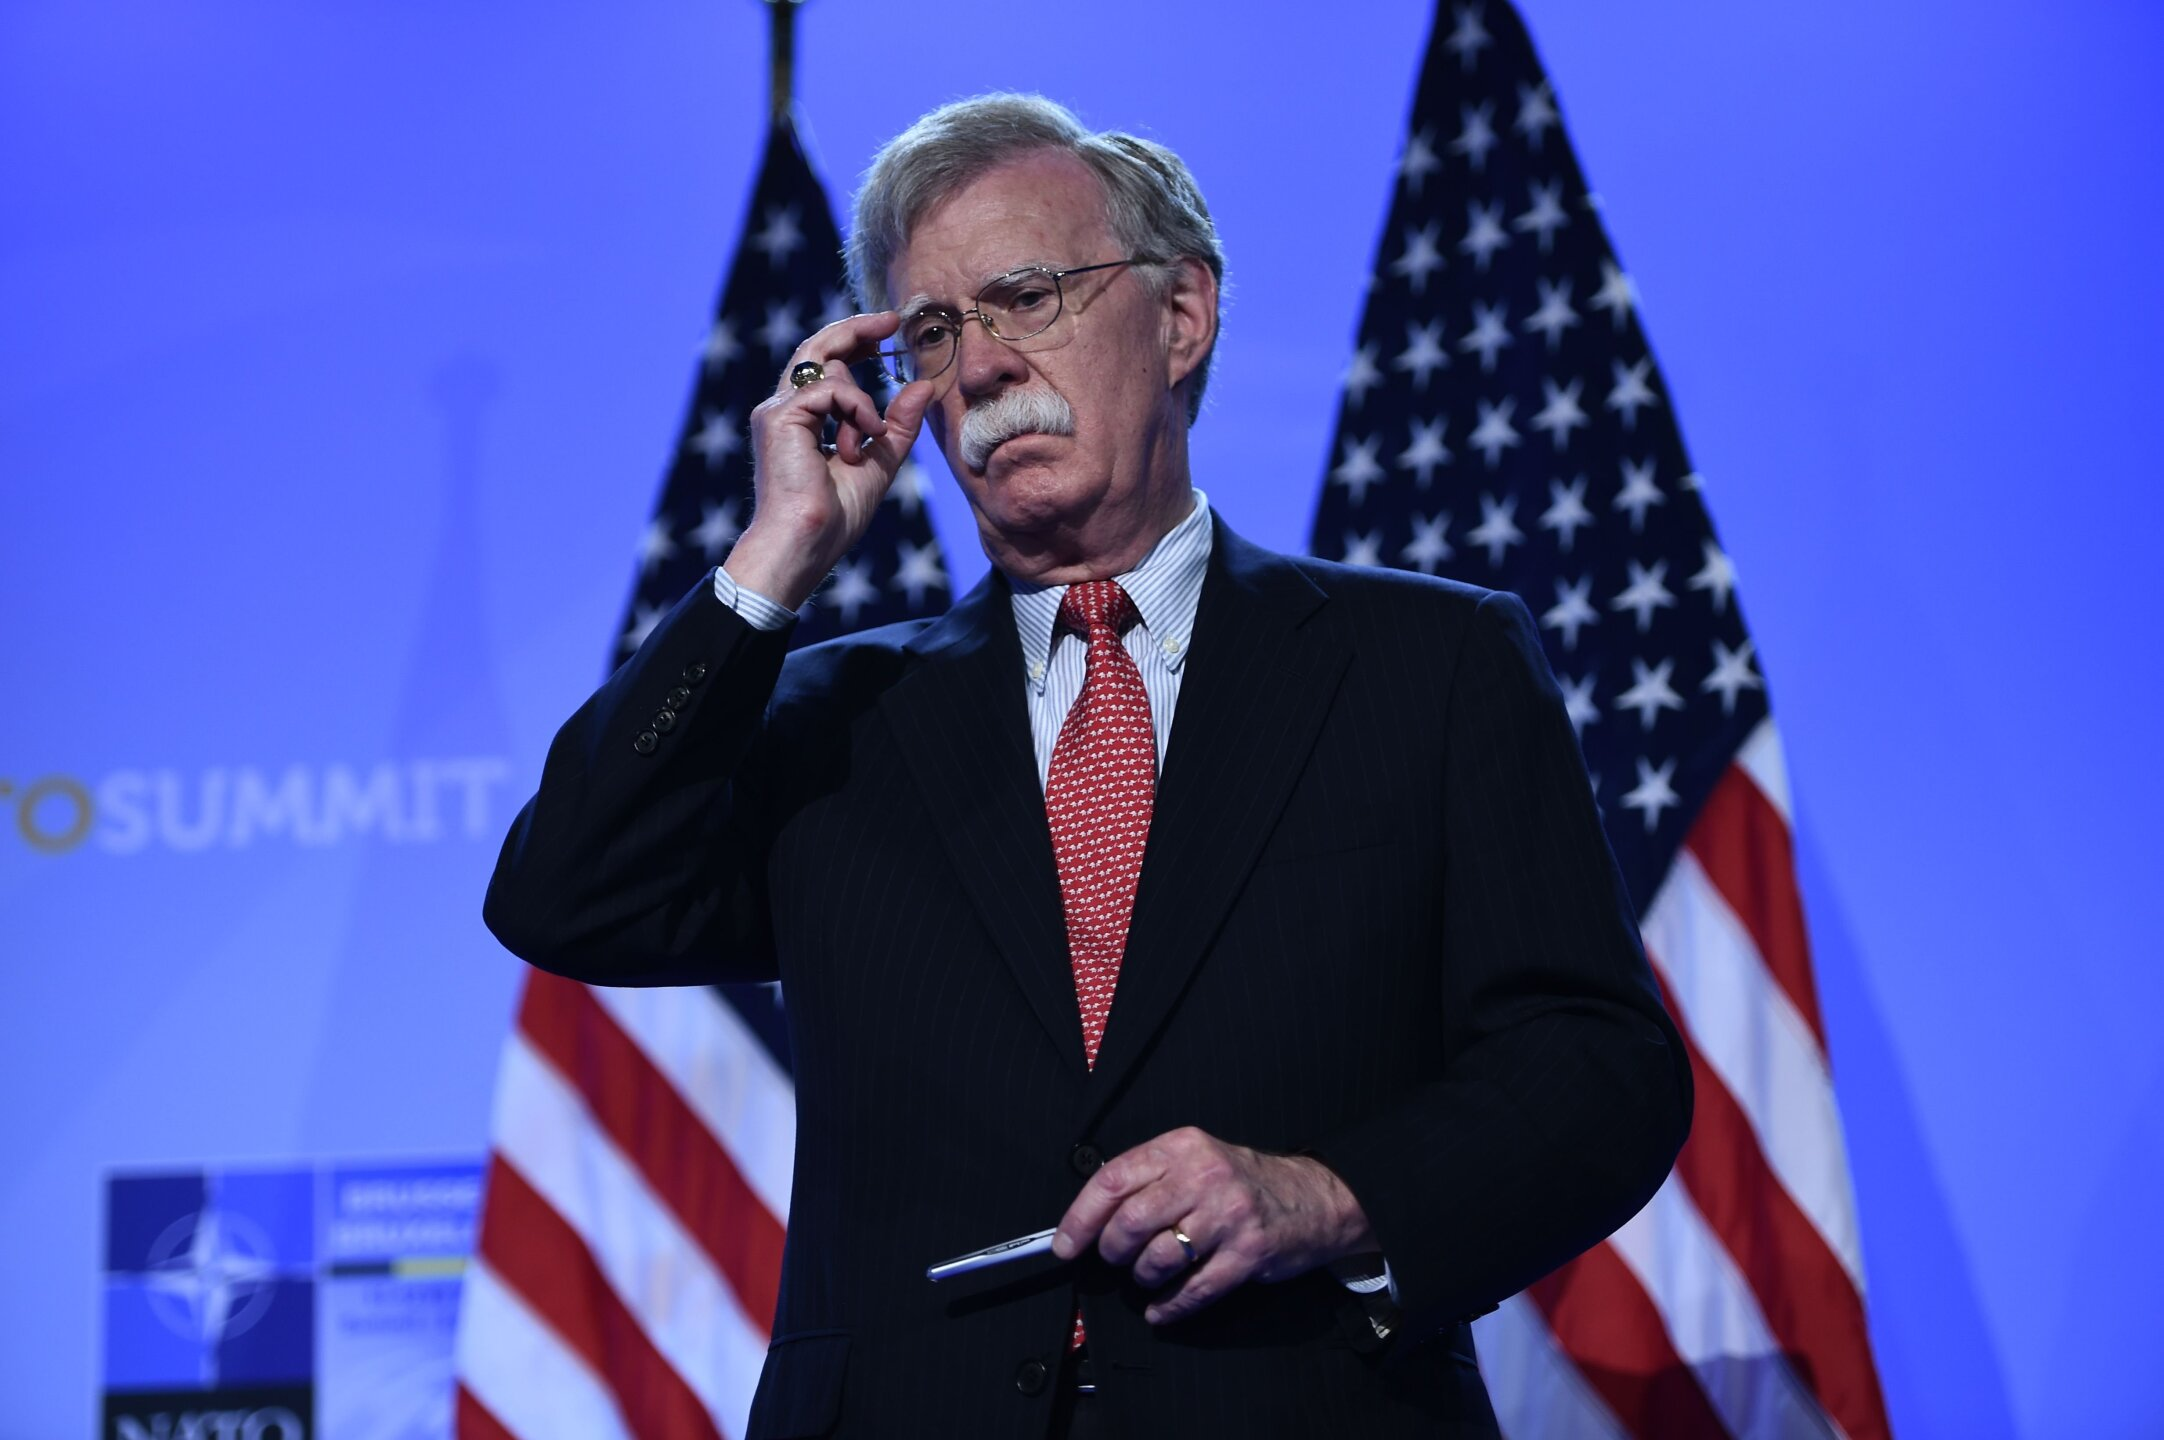 Photos: President Trump fires National Security Adviser JohnBolton